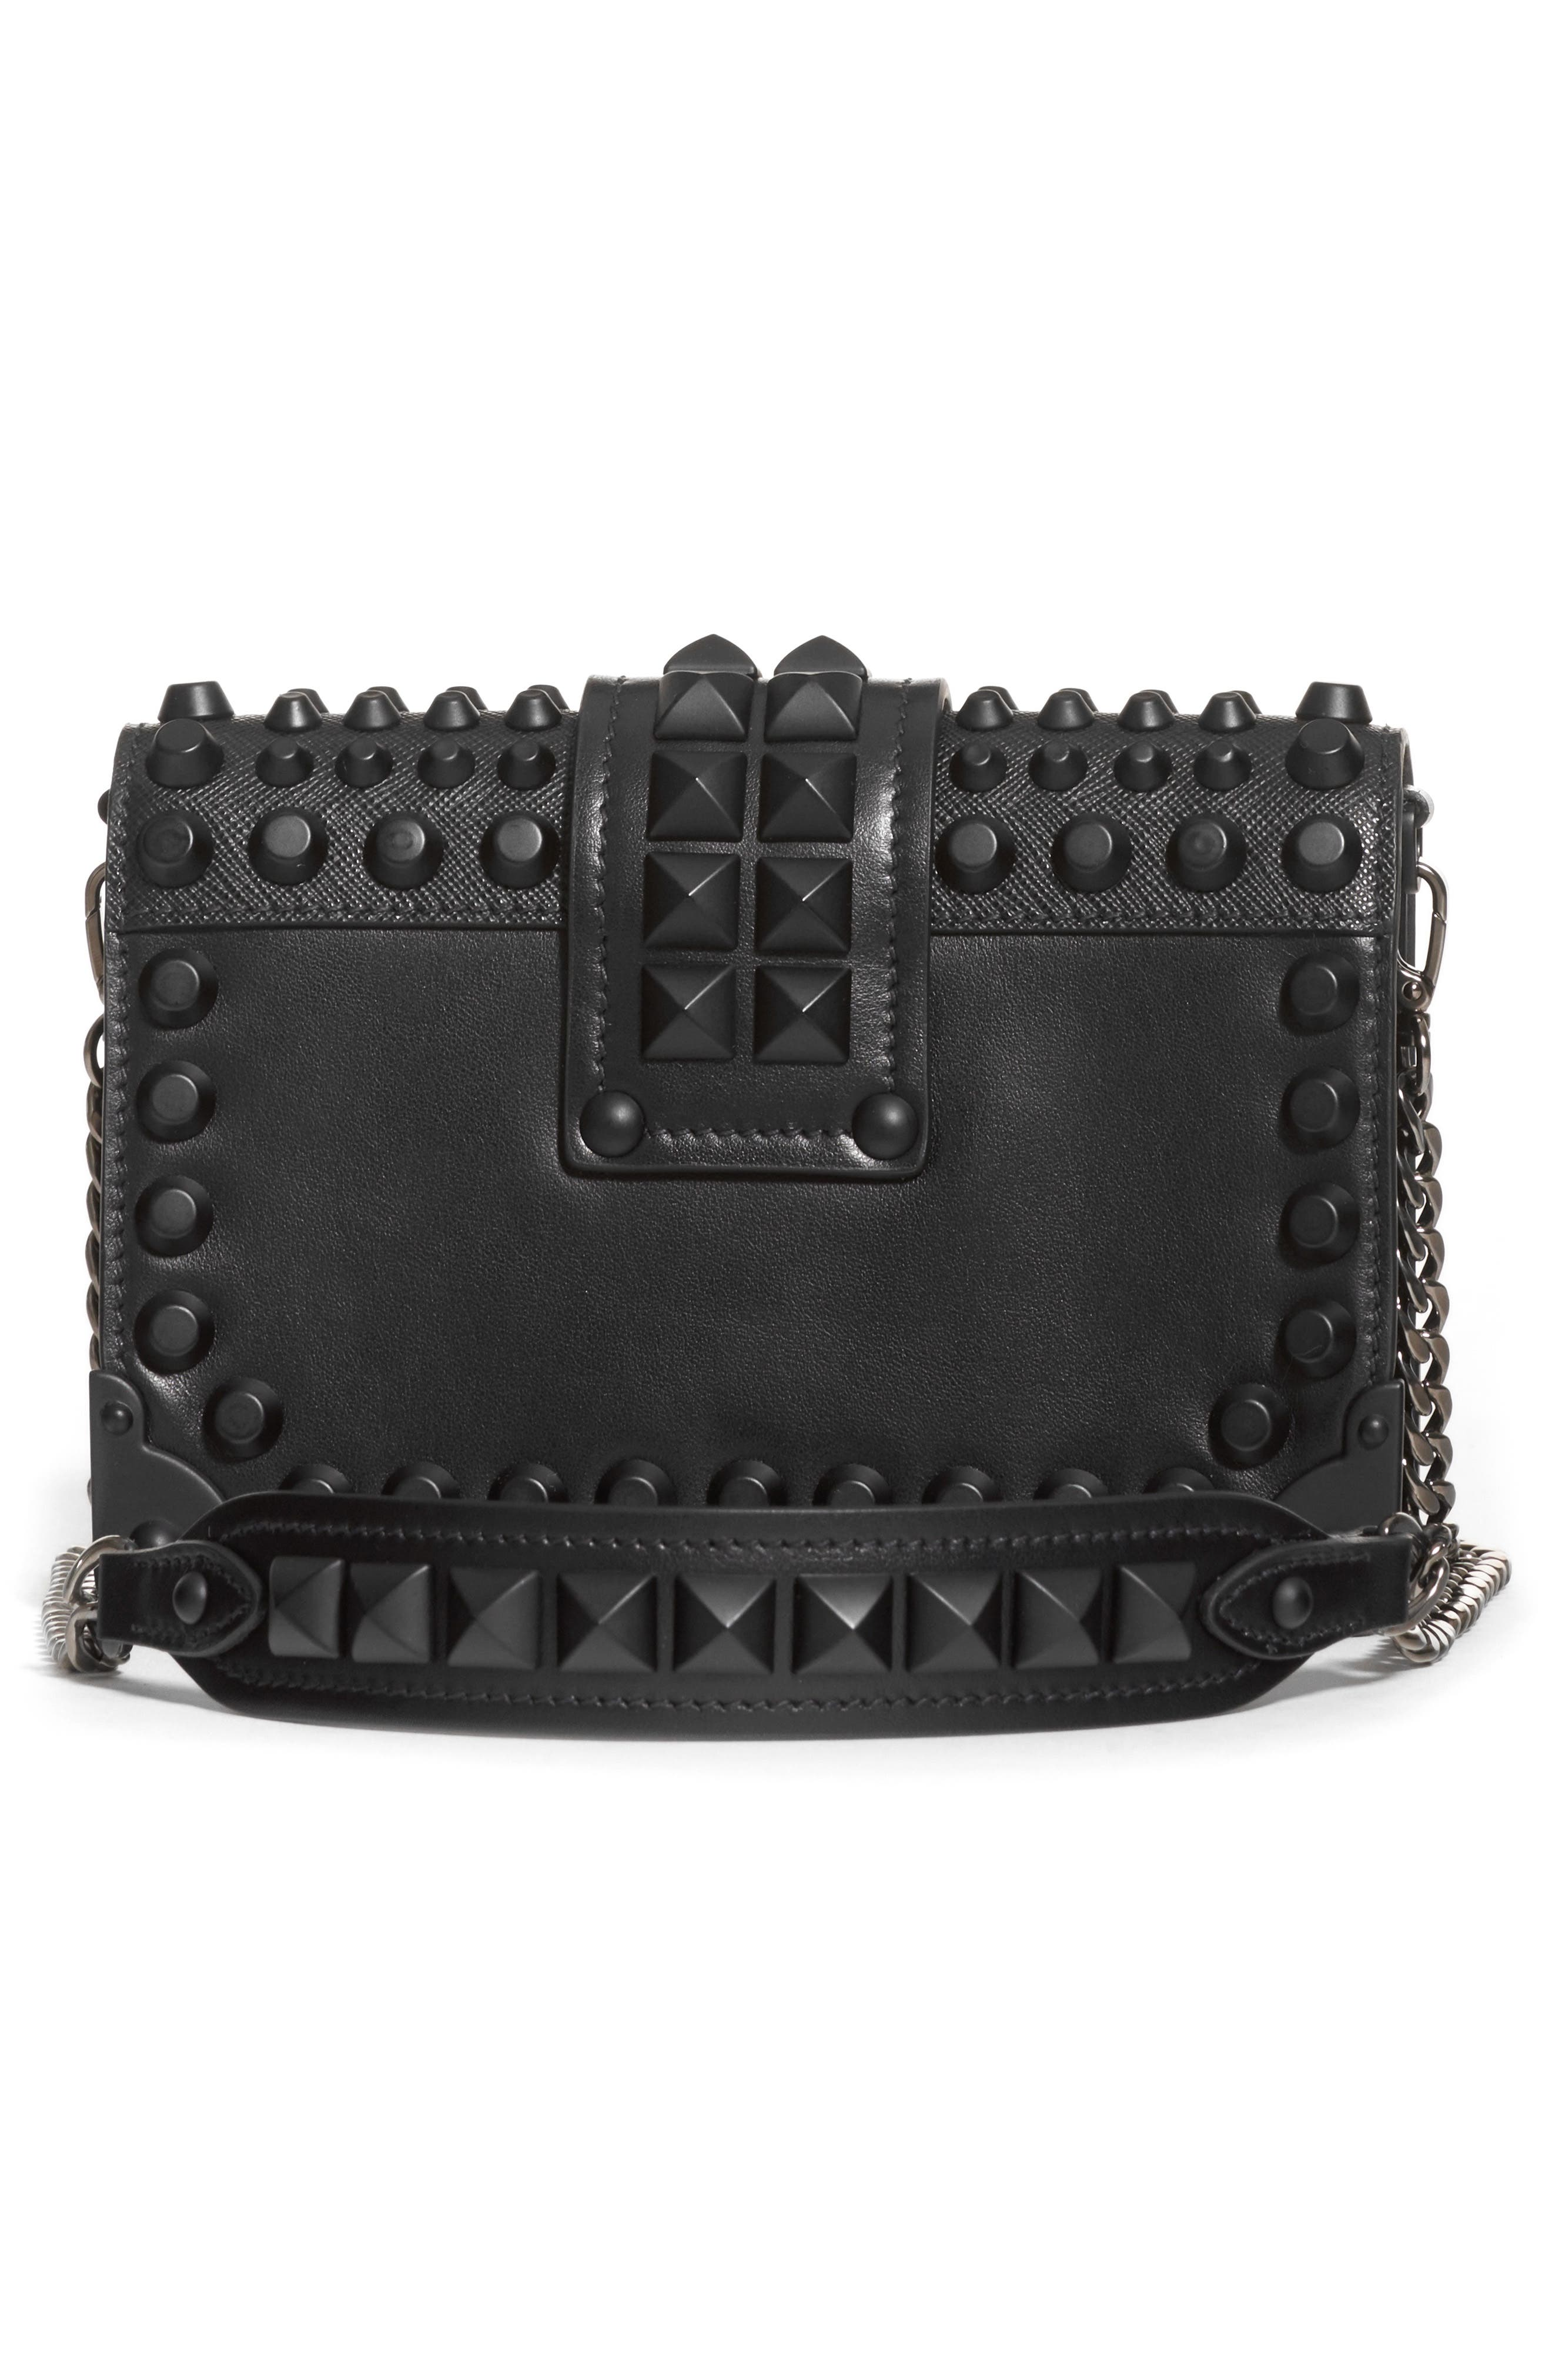 PRADA,                             Cahier Studded Leather Crossbody Bag,                             Alternate thumbnail 2, color,                             NERO/ NERO